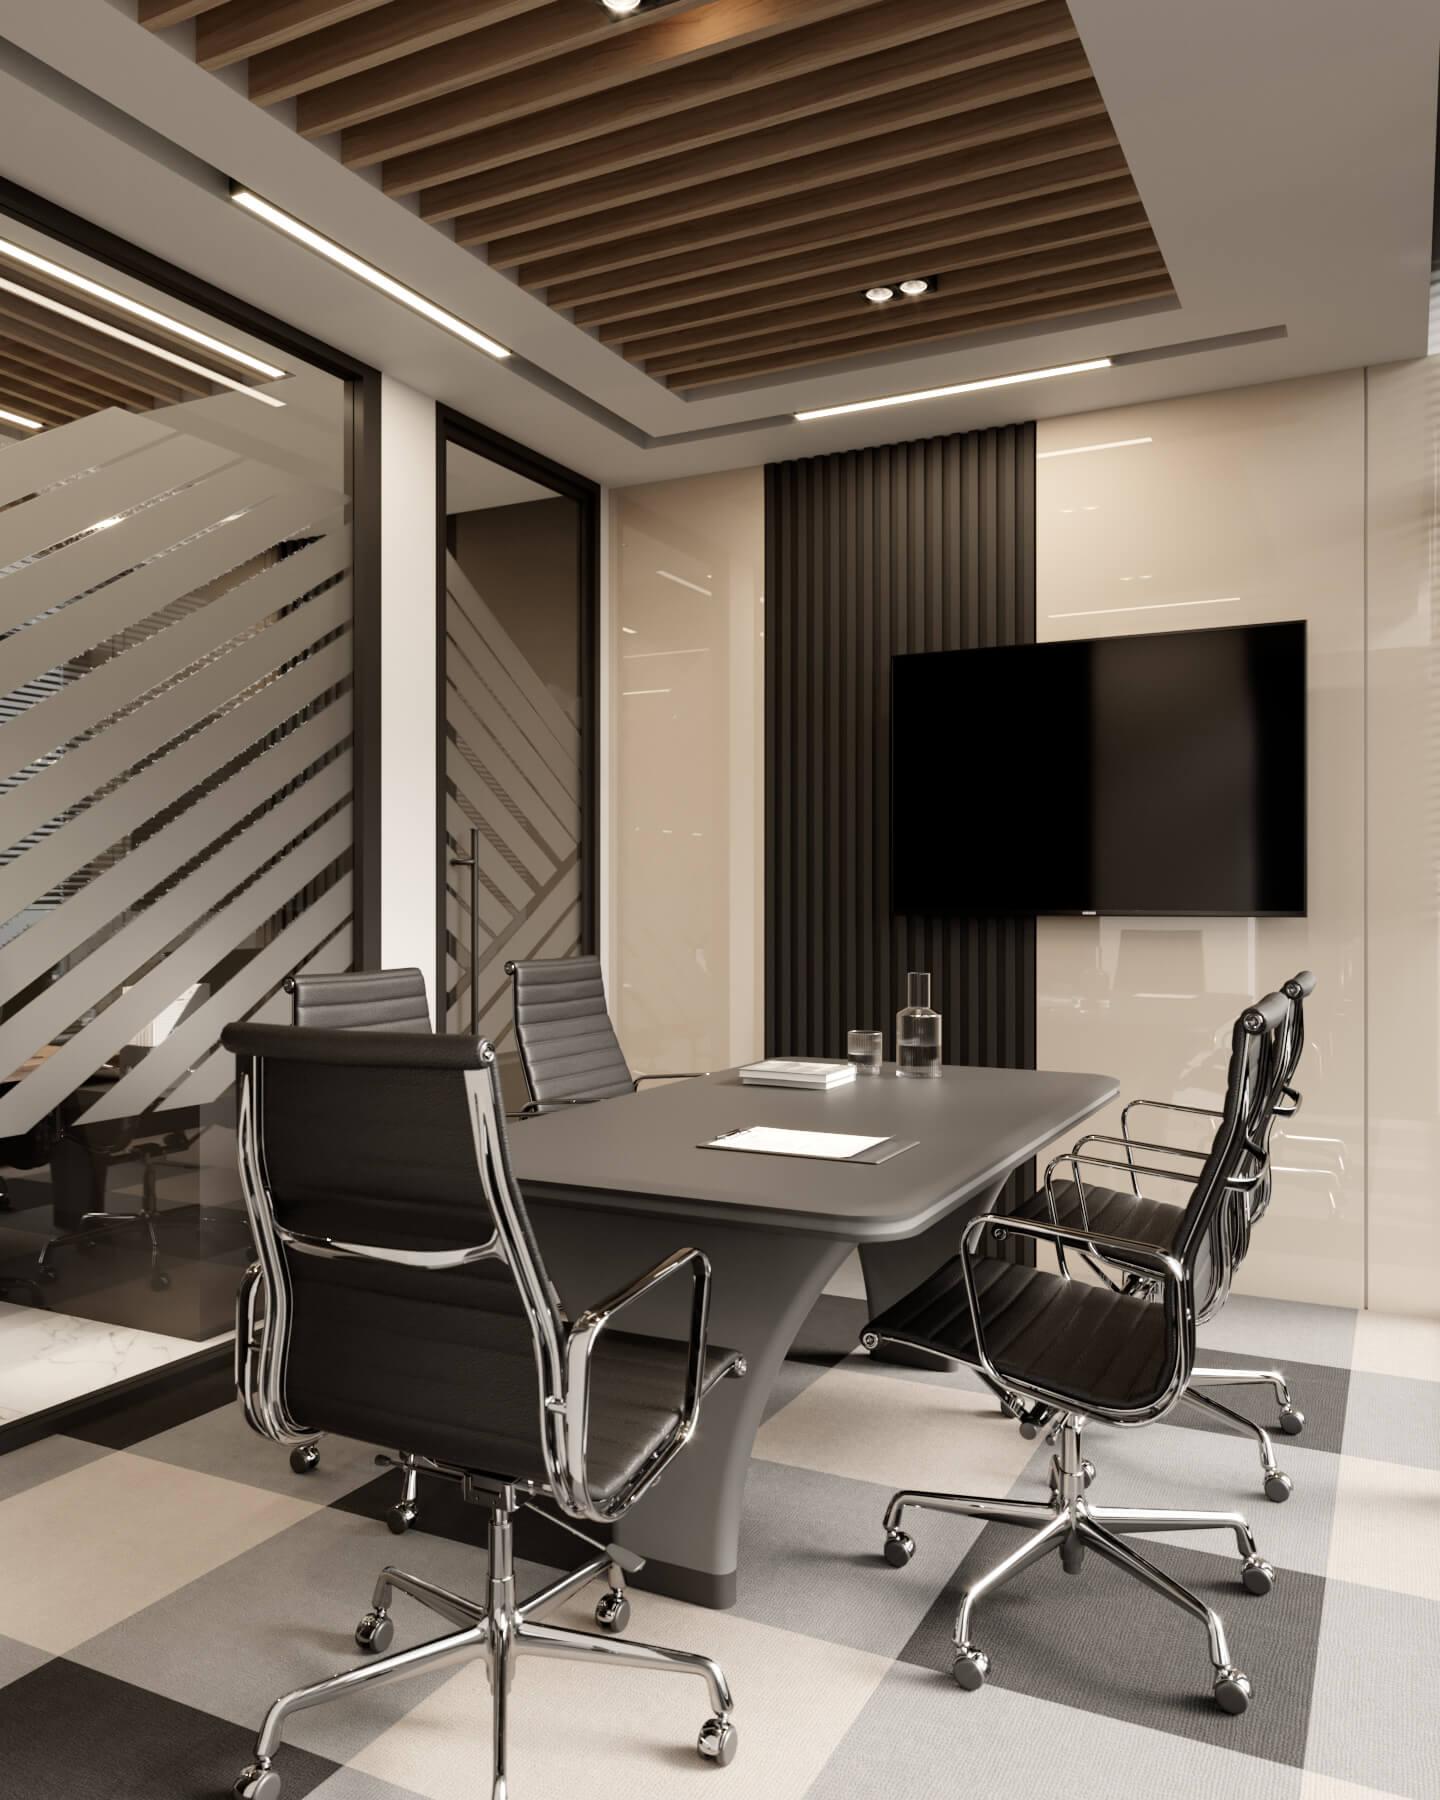 ofis mimari 4106 Anadolu Hayat Emeklilik Ofisler